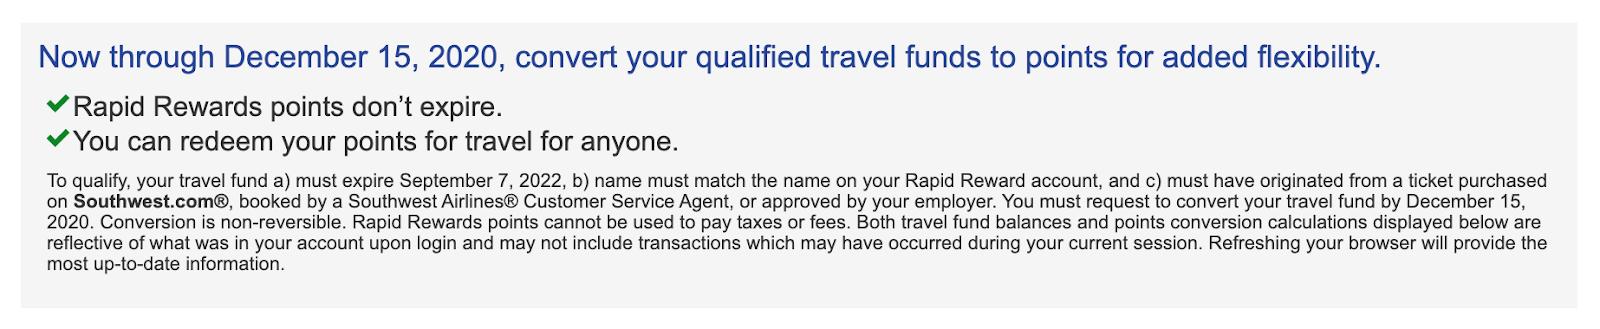 Screenshot of Southwest Travel Funds information